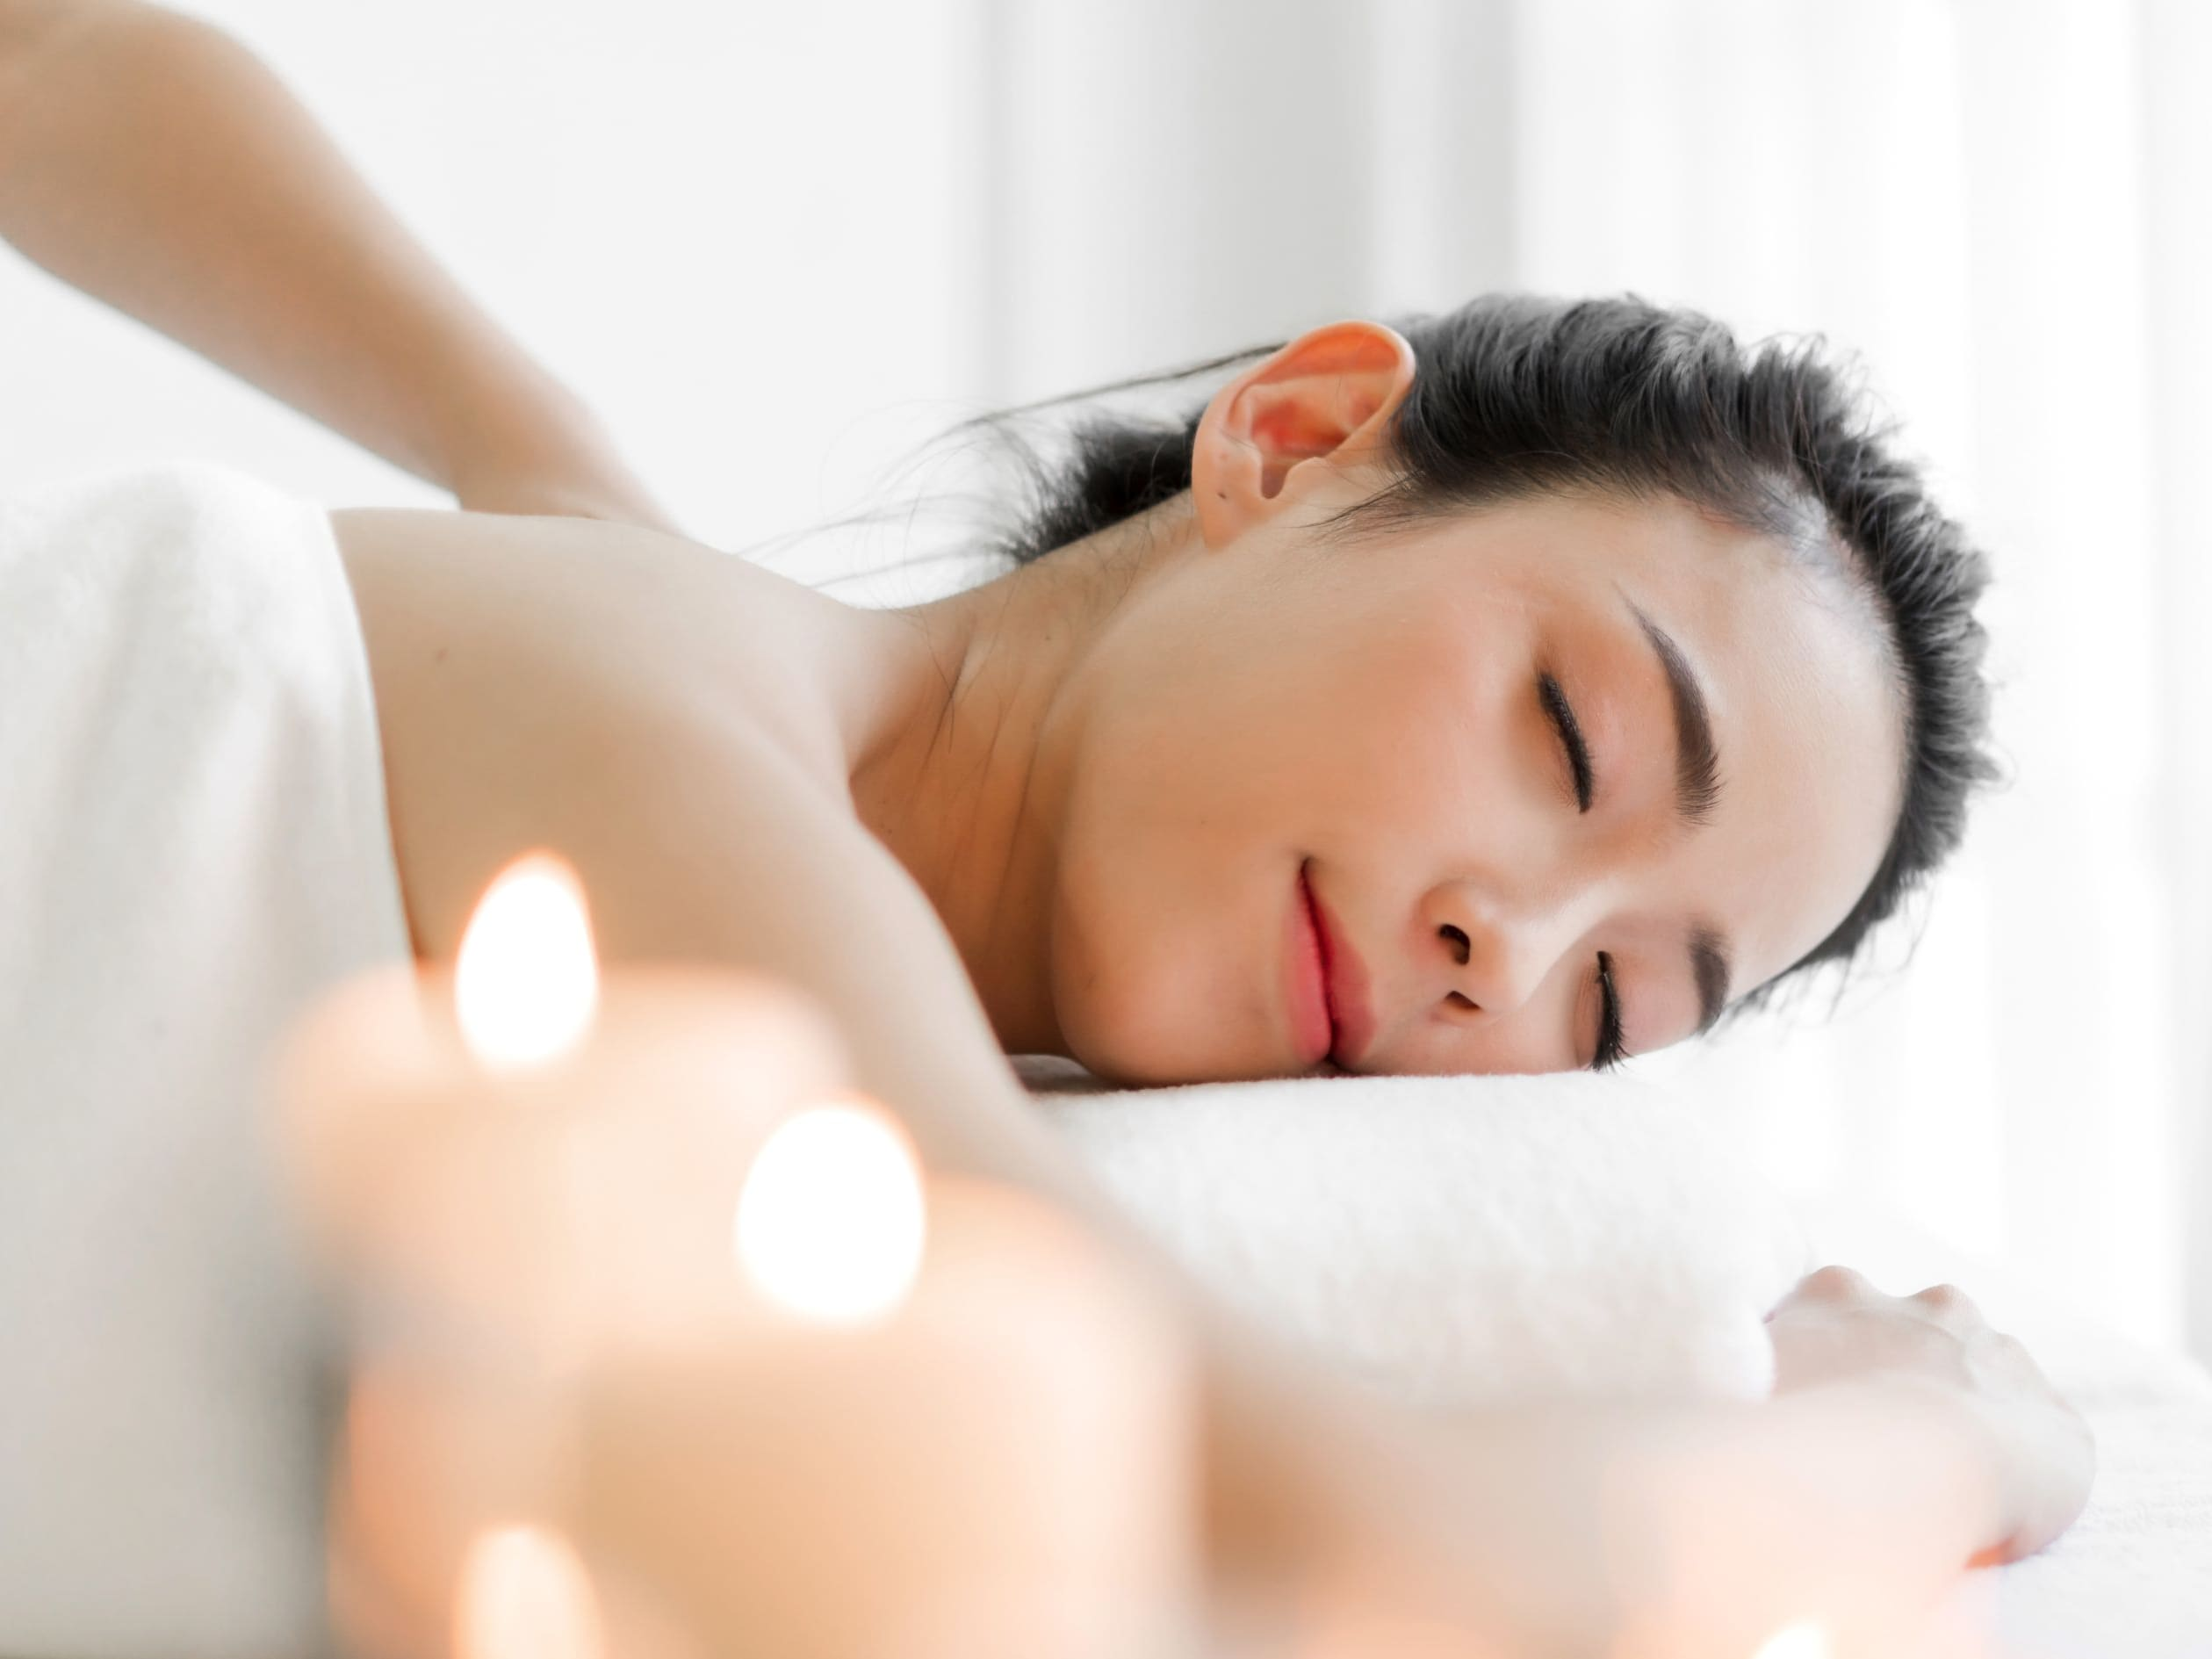 60-Min Swedish Full Body Massage for 1 person